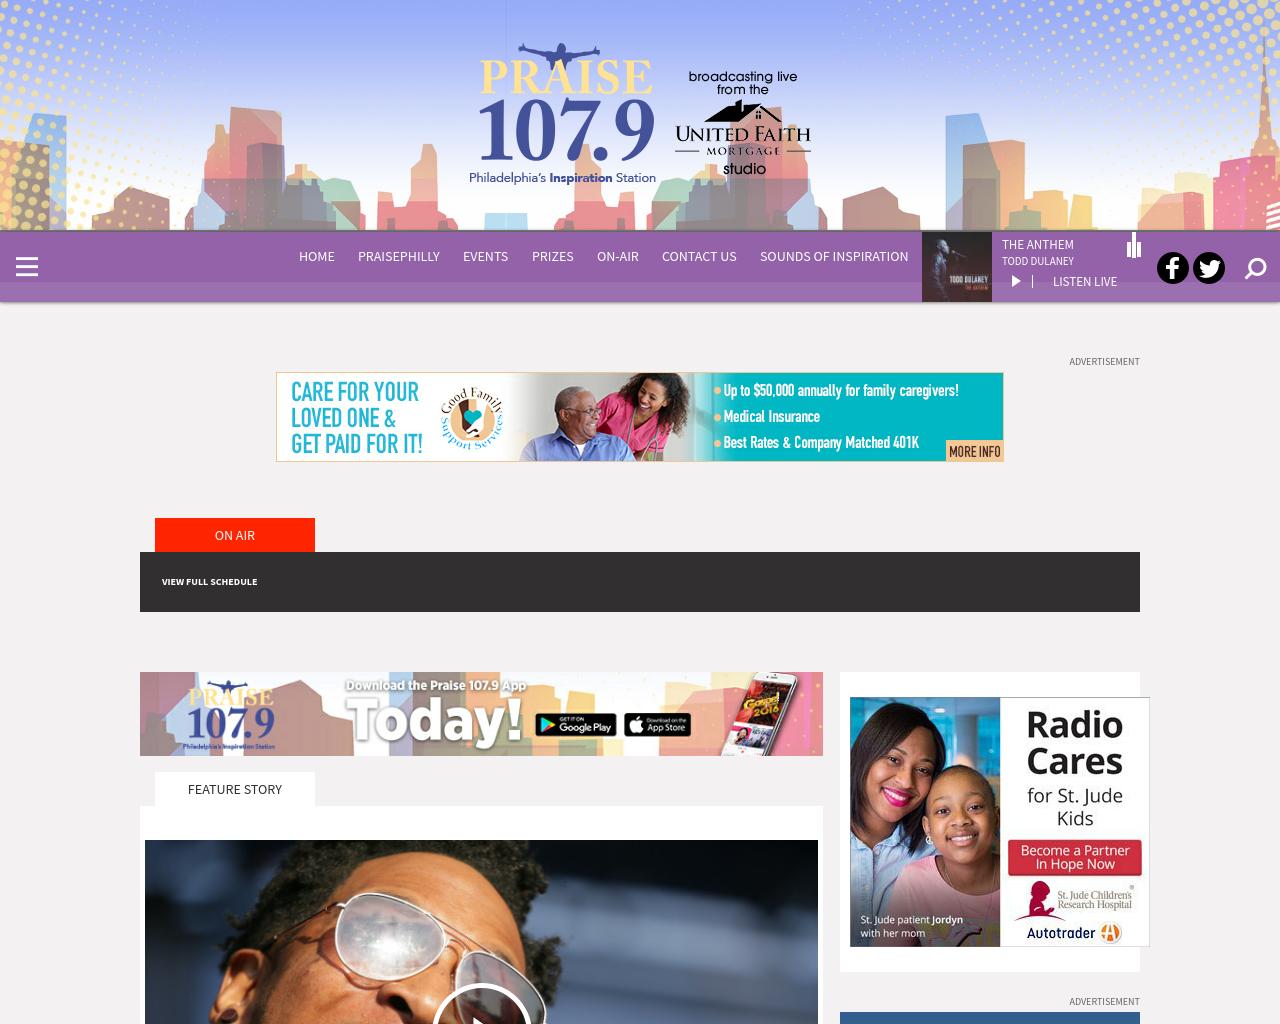 Digital-Radio-One-Philadelphia-Advertising-Reviews-Pricing